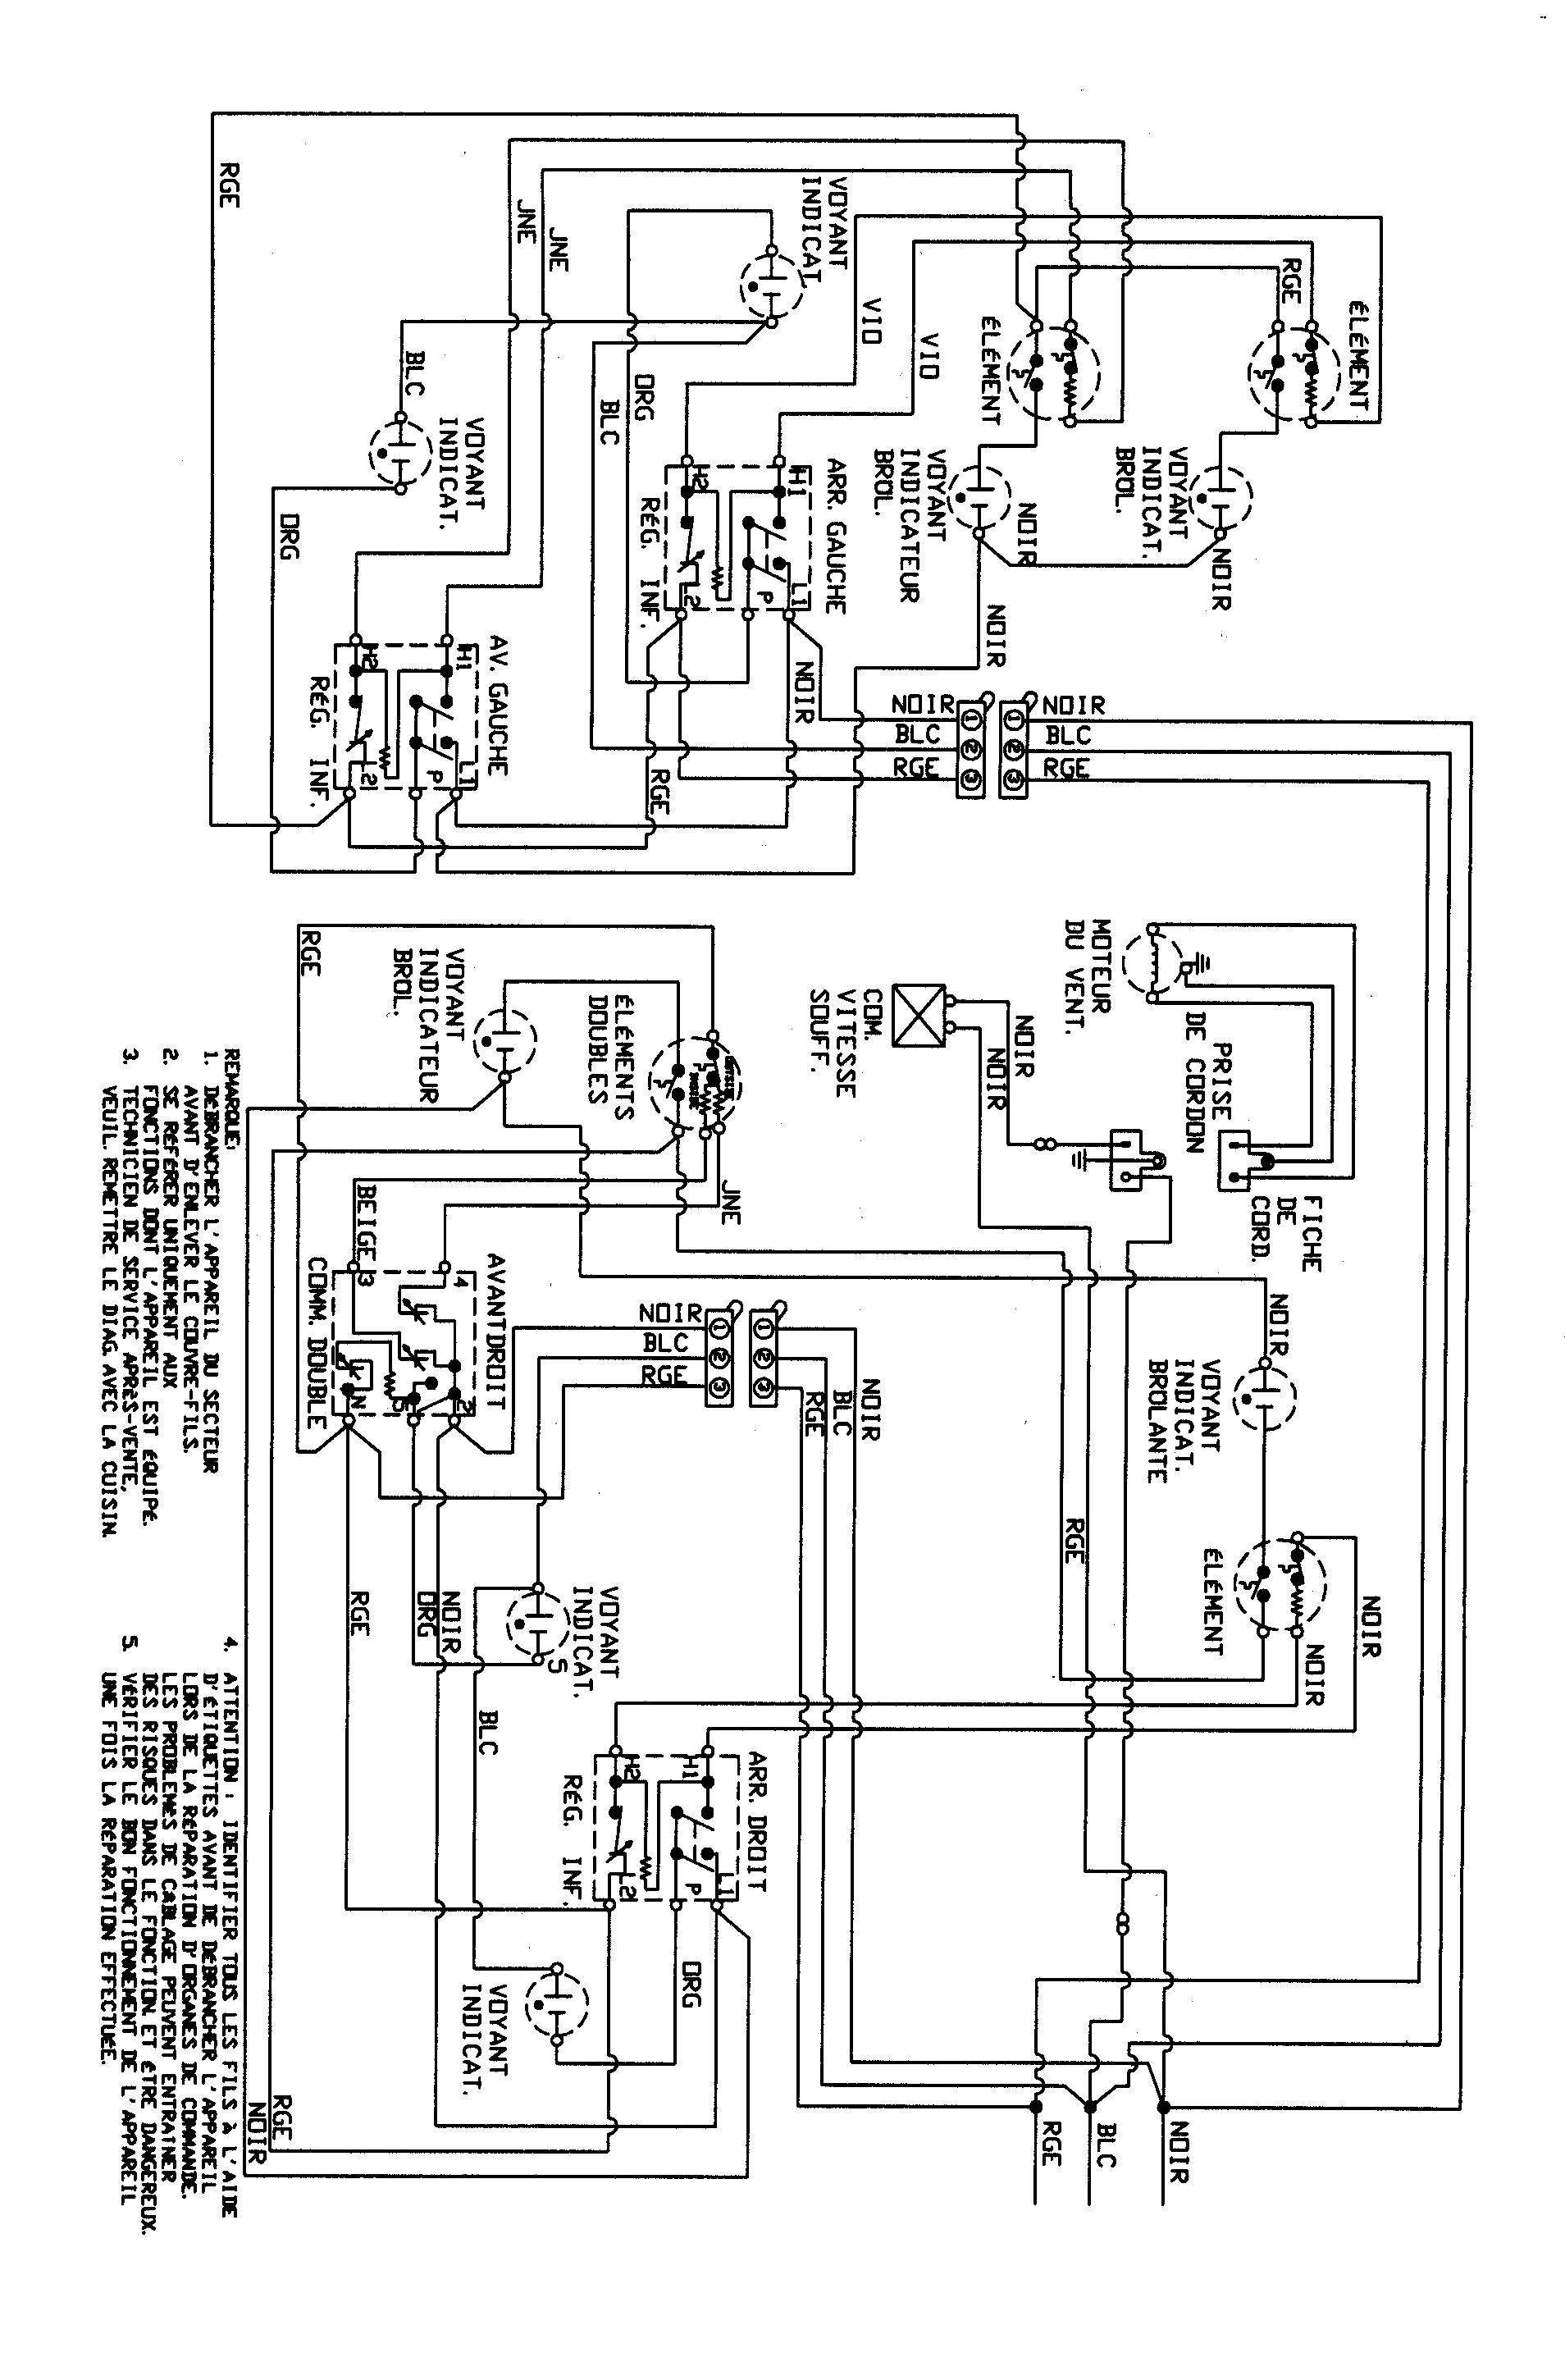 OC_5499] Jenn Air Wiring Schematic Download DiagramInrebe Eatte Ginia Monoc Isra Mohammedshrine Librar Wiring 101